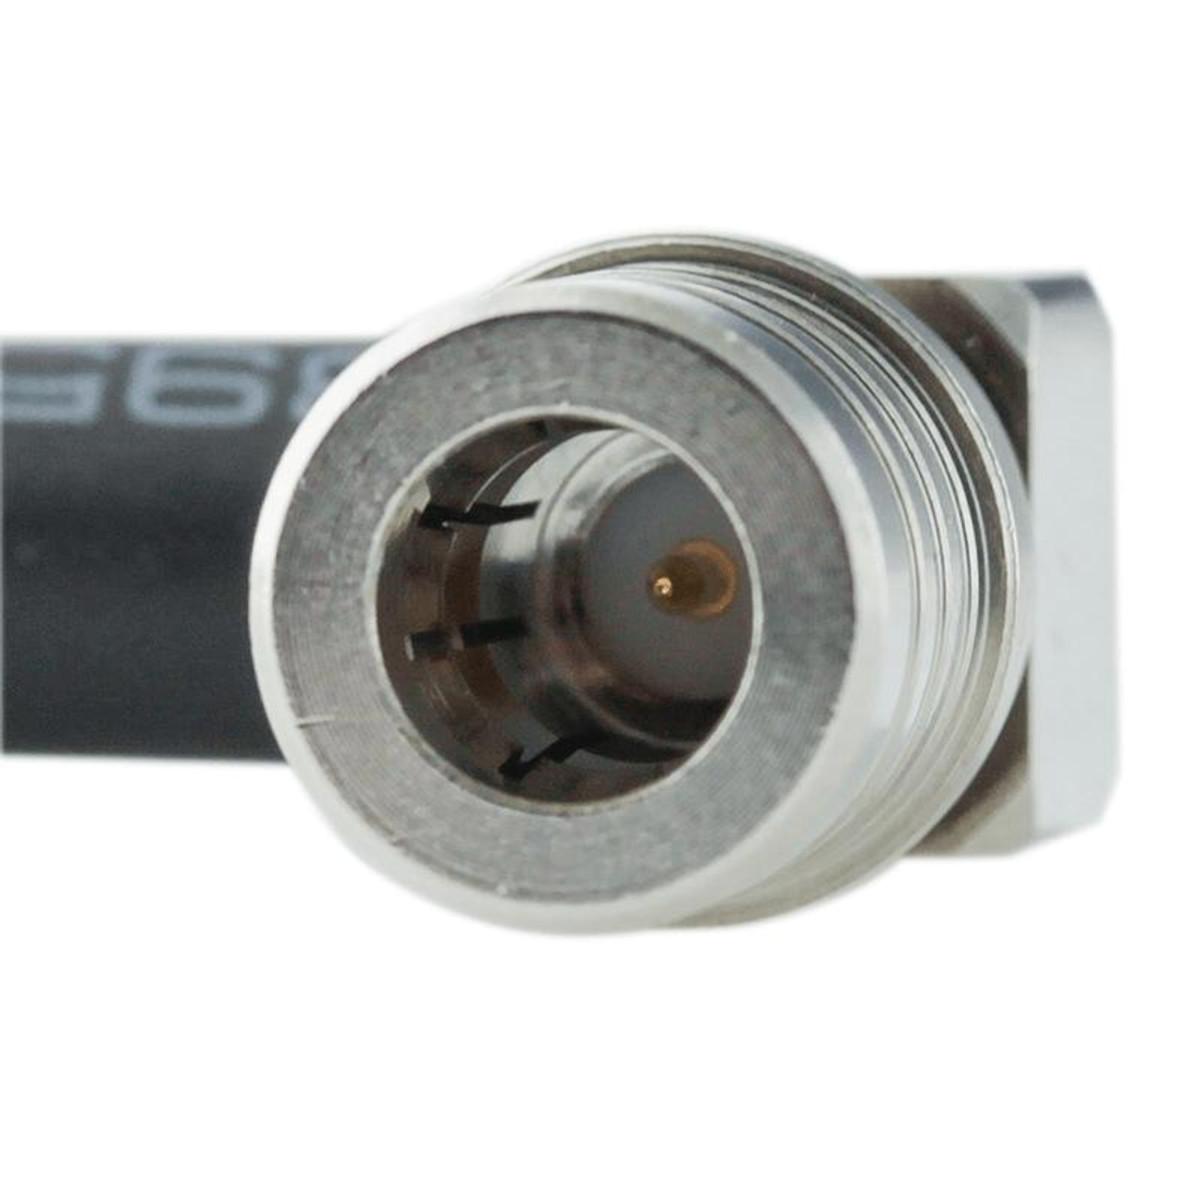 Bolton Tech Bolton Technical 1 foot N-Female Bulkhead to QMA-Male Angle Coax RF Pigtail Cable